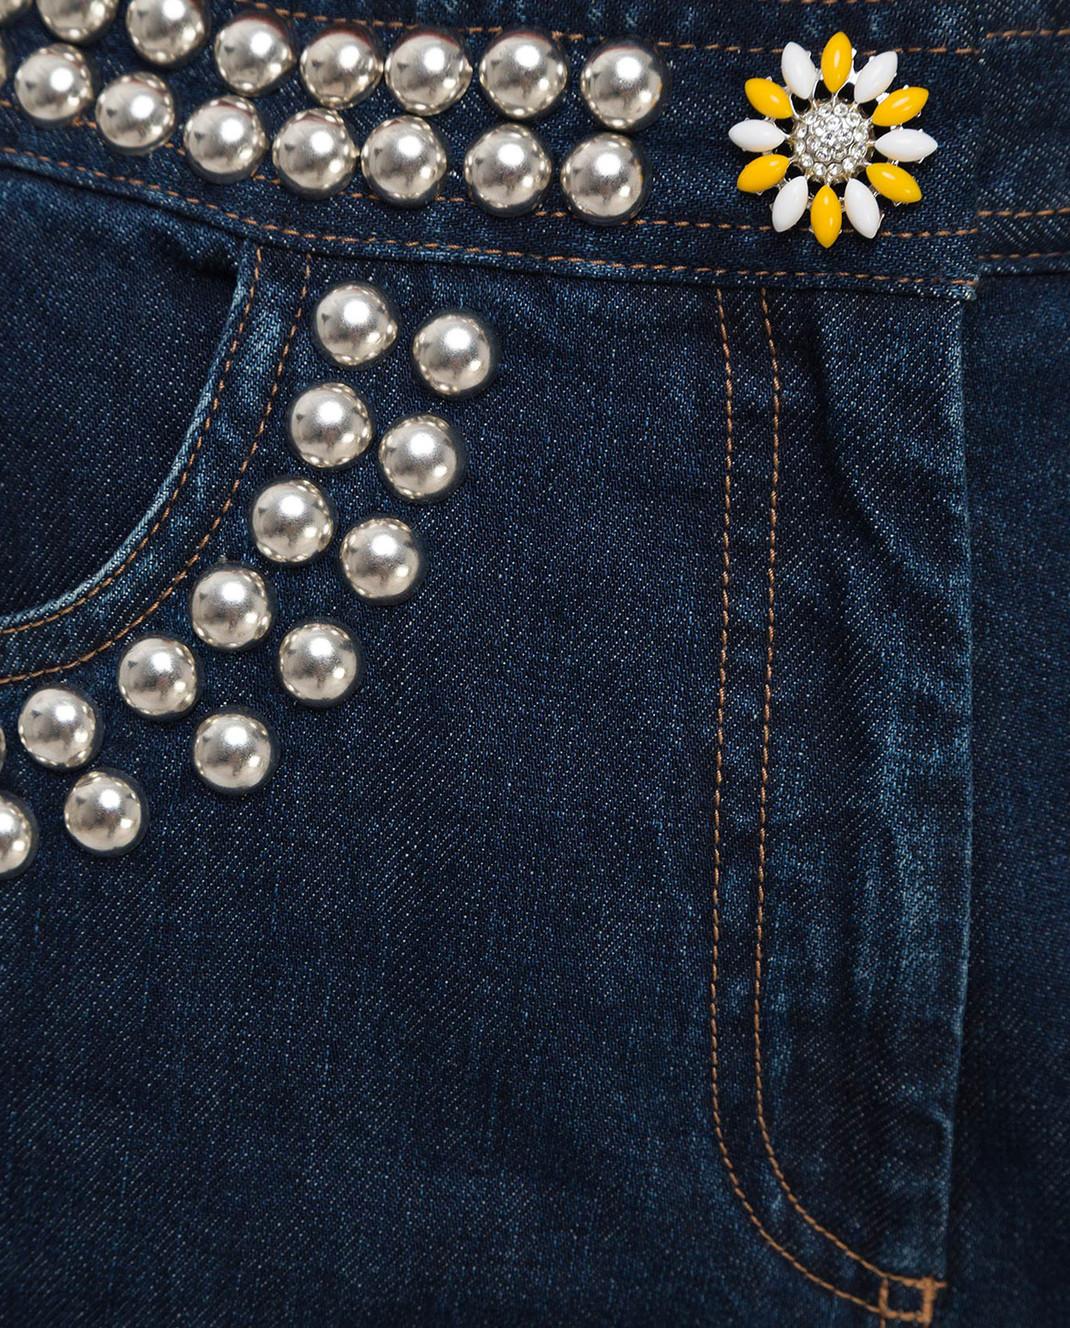 Miu Miu Темно-синие джинсы GWP192 изображение 5